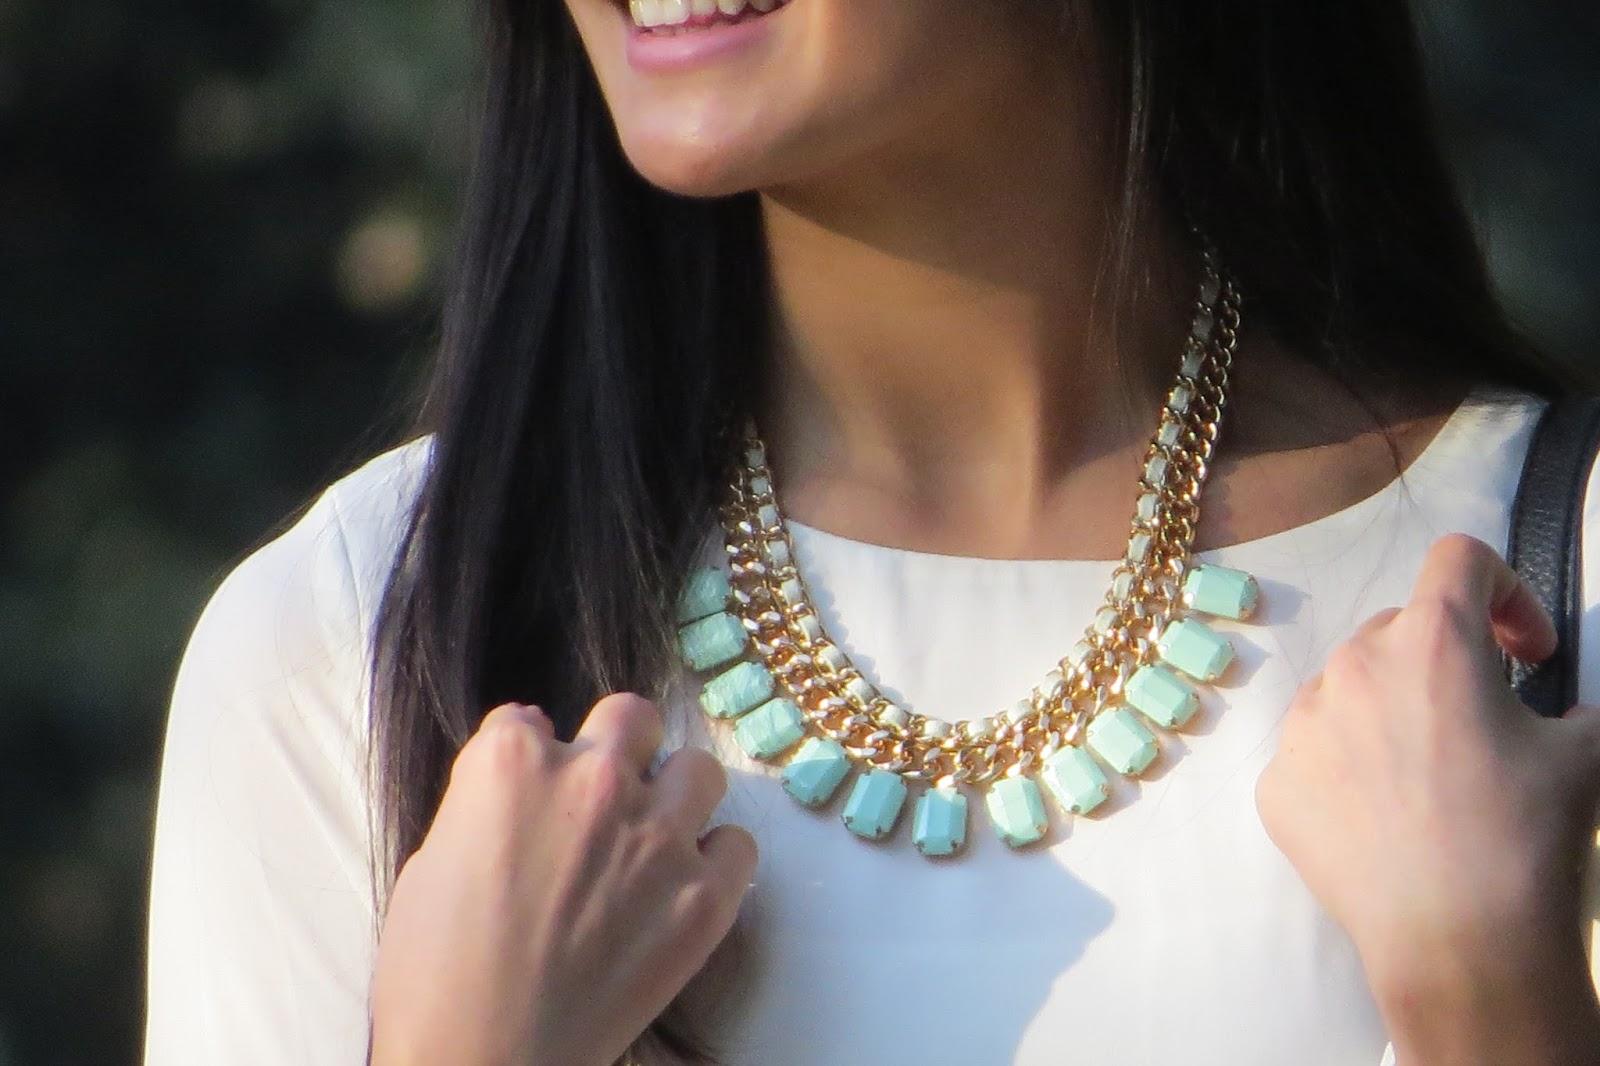 Charming_charlies_white_blouse